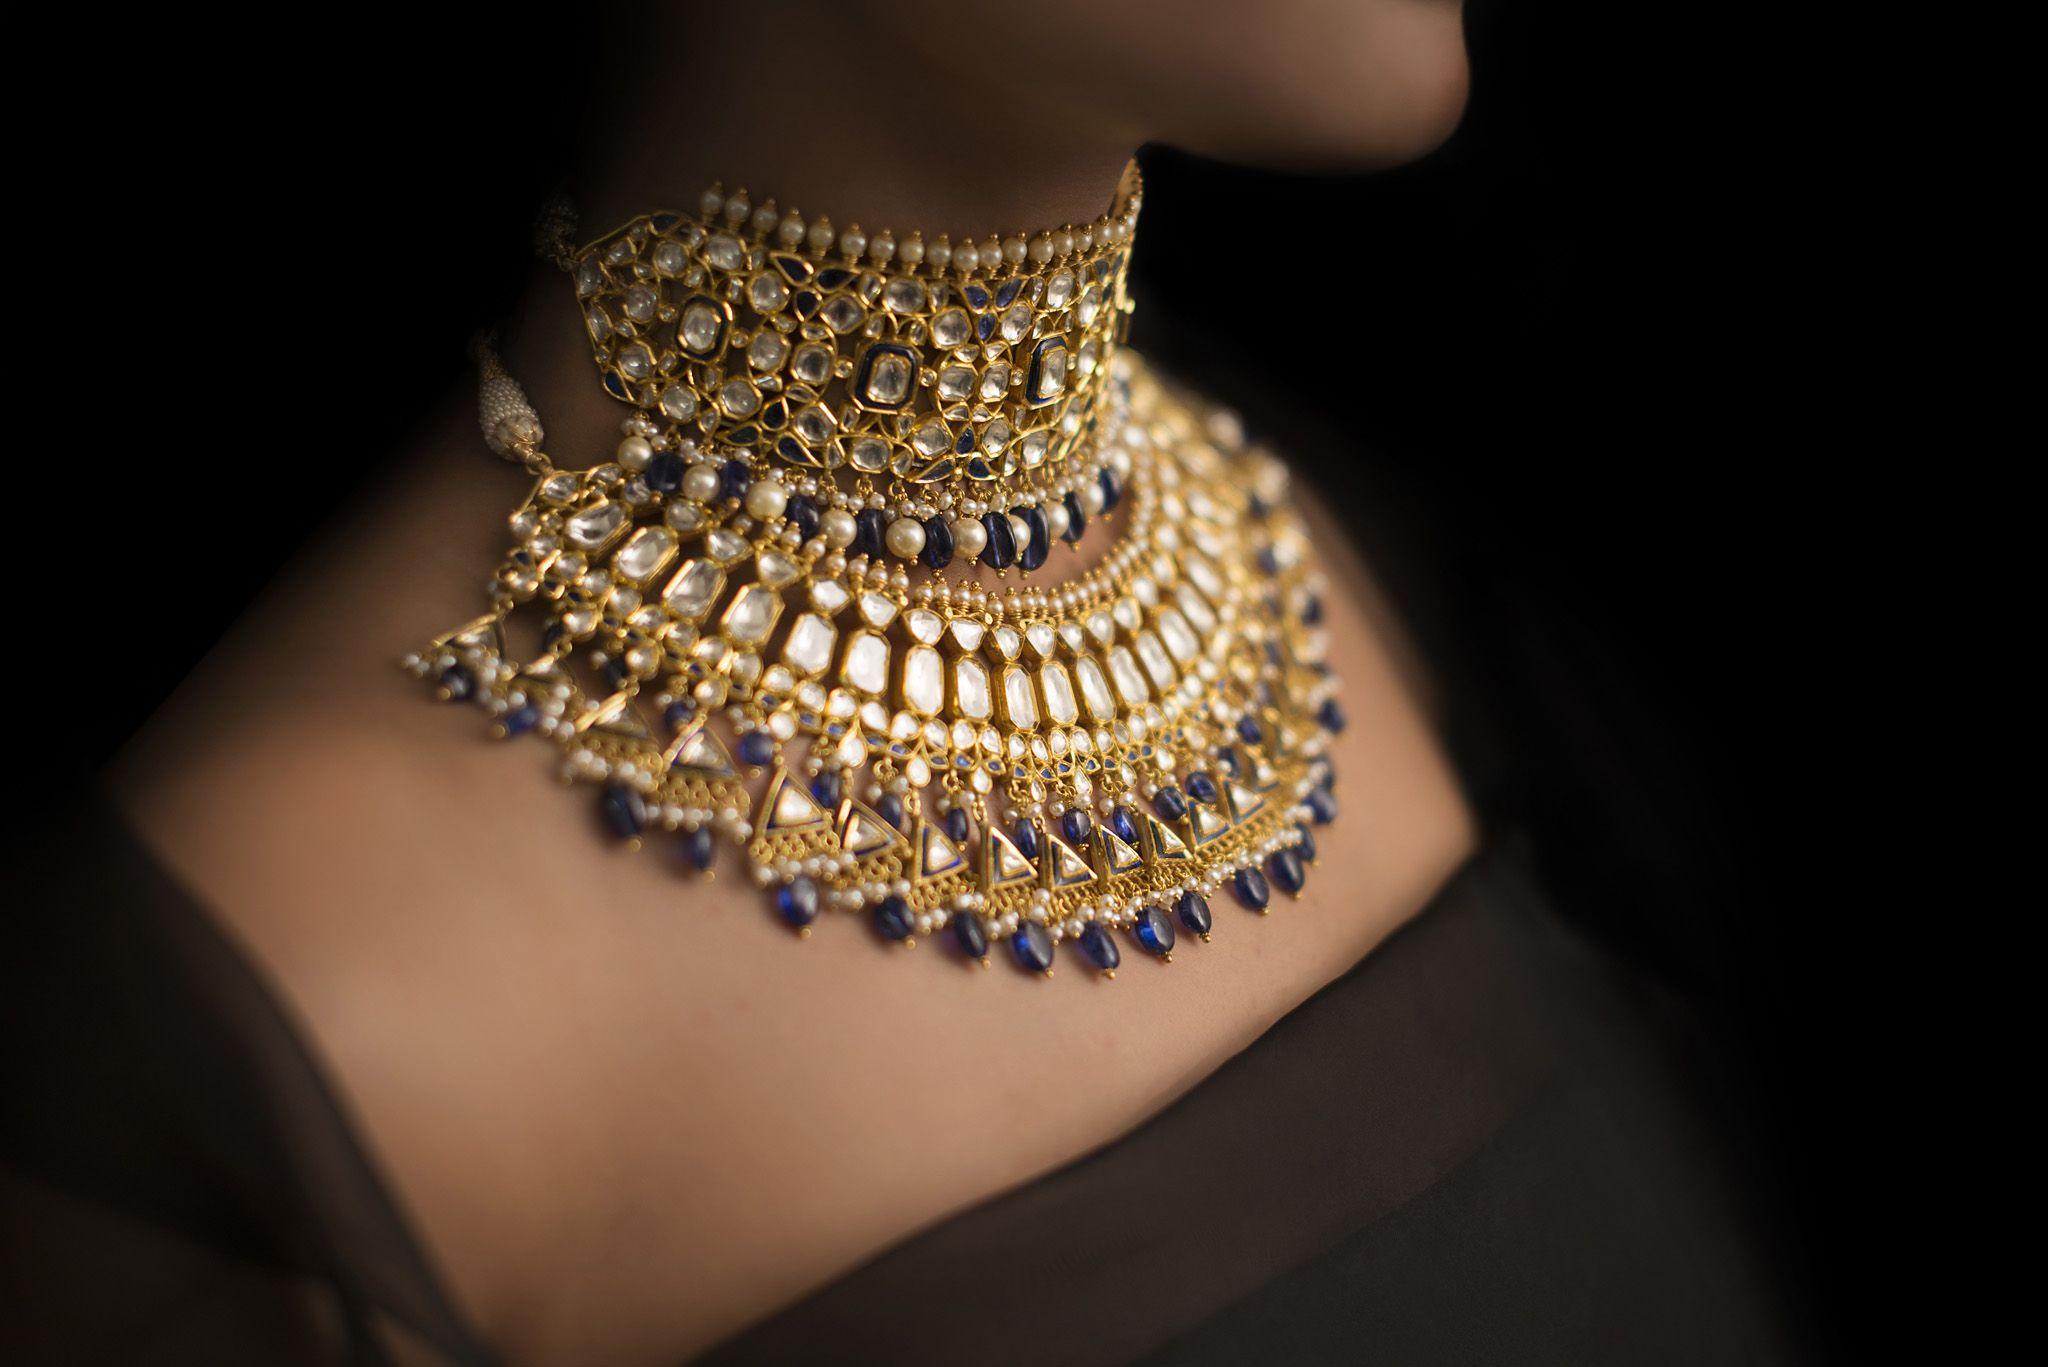 Pin by dailylady on jewelry pinterest